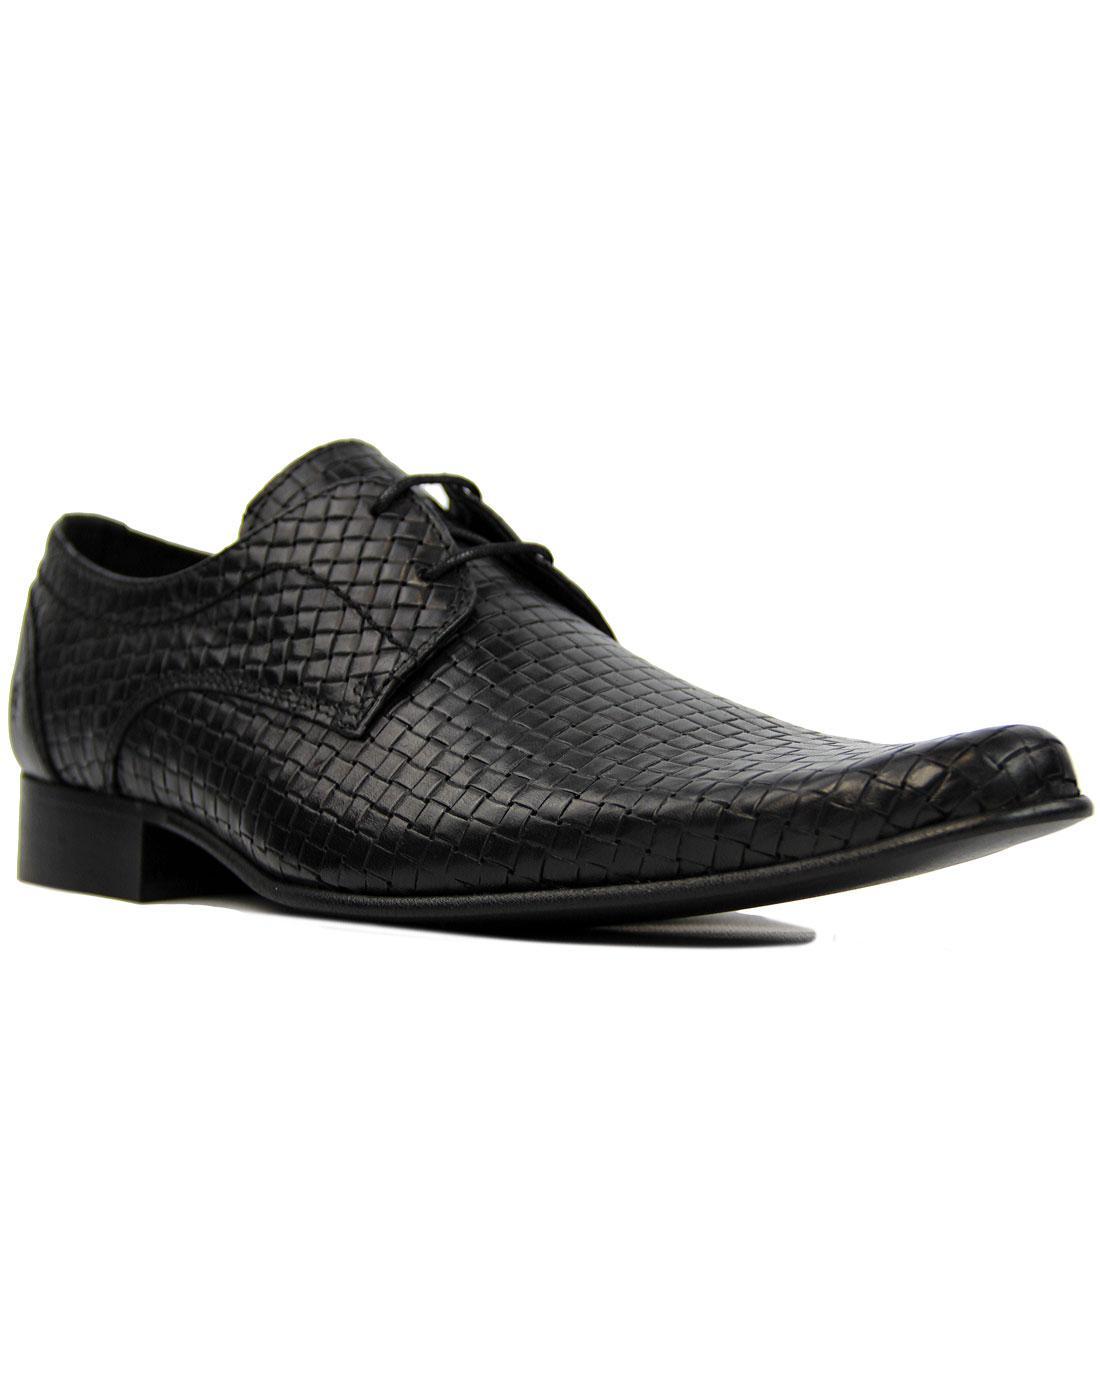 Buckler IKON ORIGINAL Retro Mod Basketweave Shoes